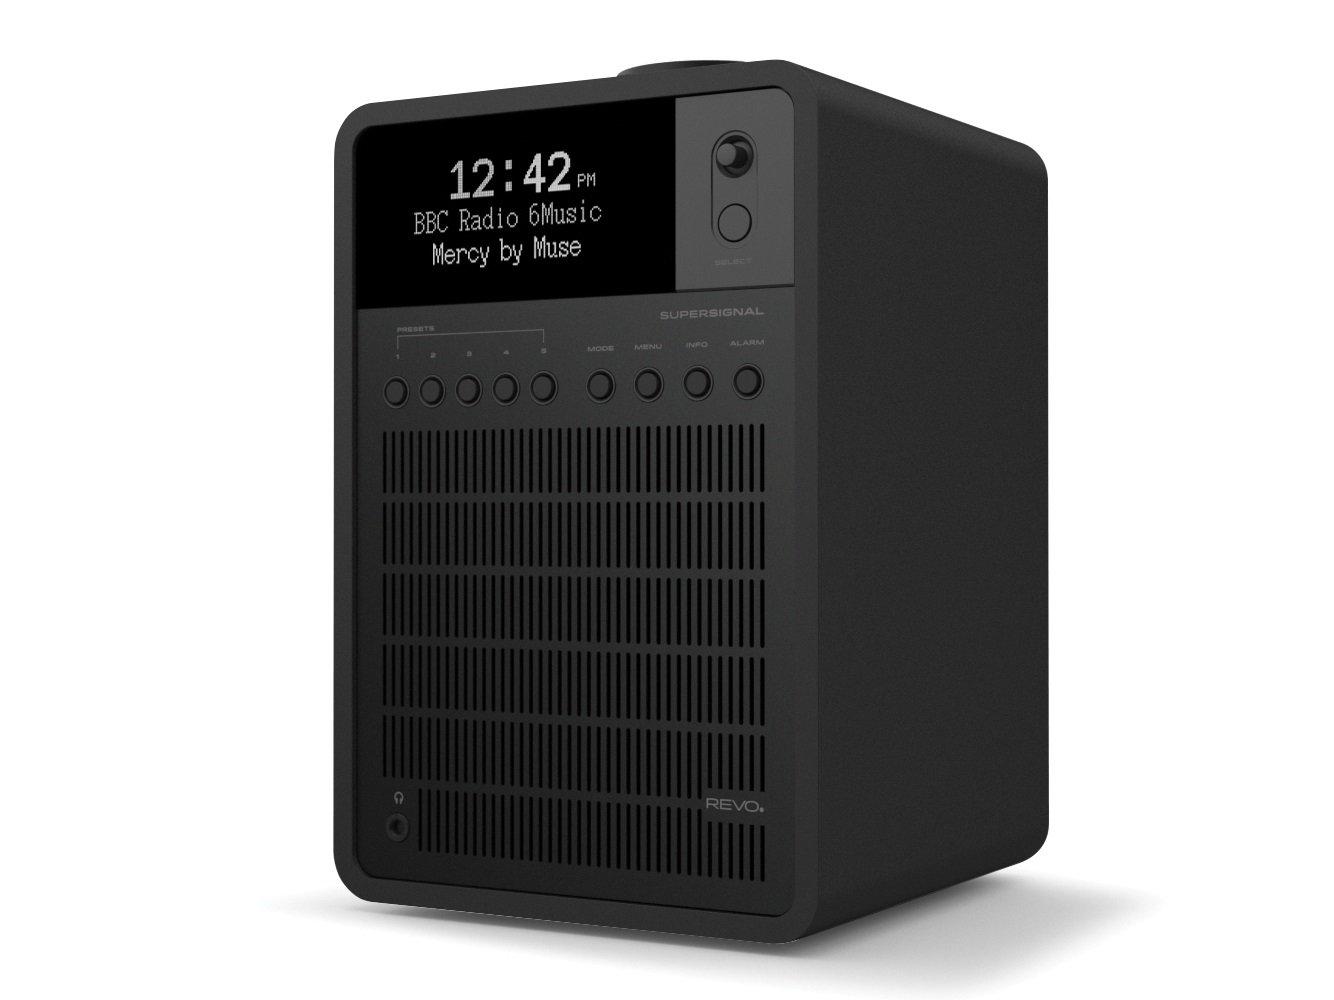 REVO SuperSignal Deluxe Radio with DAB/DAB+/FM Reception, Digital Alarm and Bluetooth Wireless Streaming - ''Shadow'' by Revo